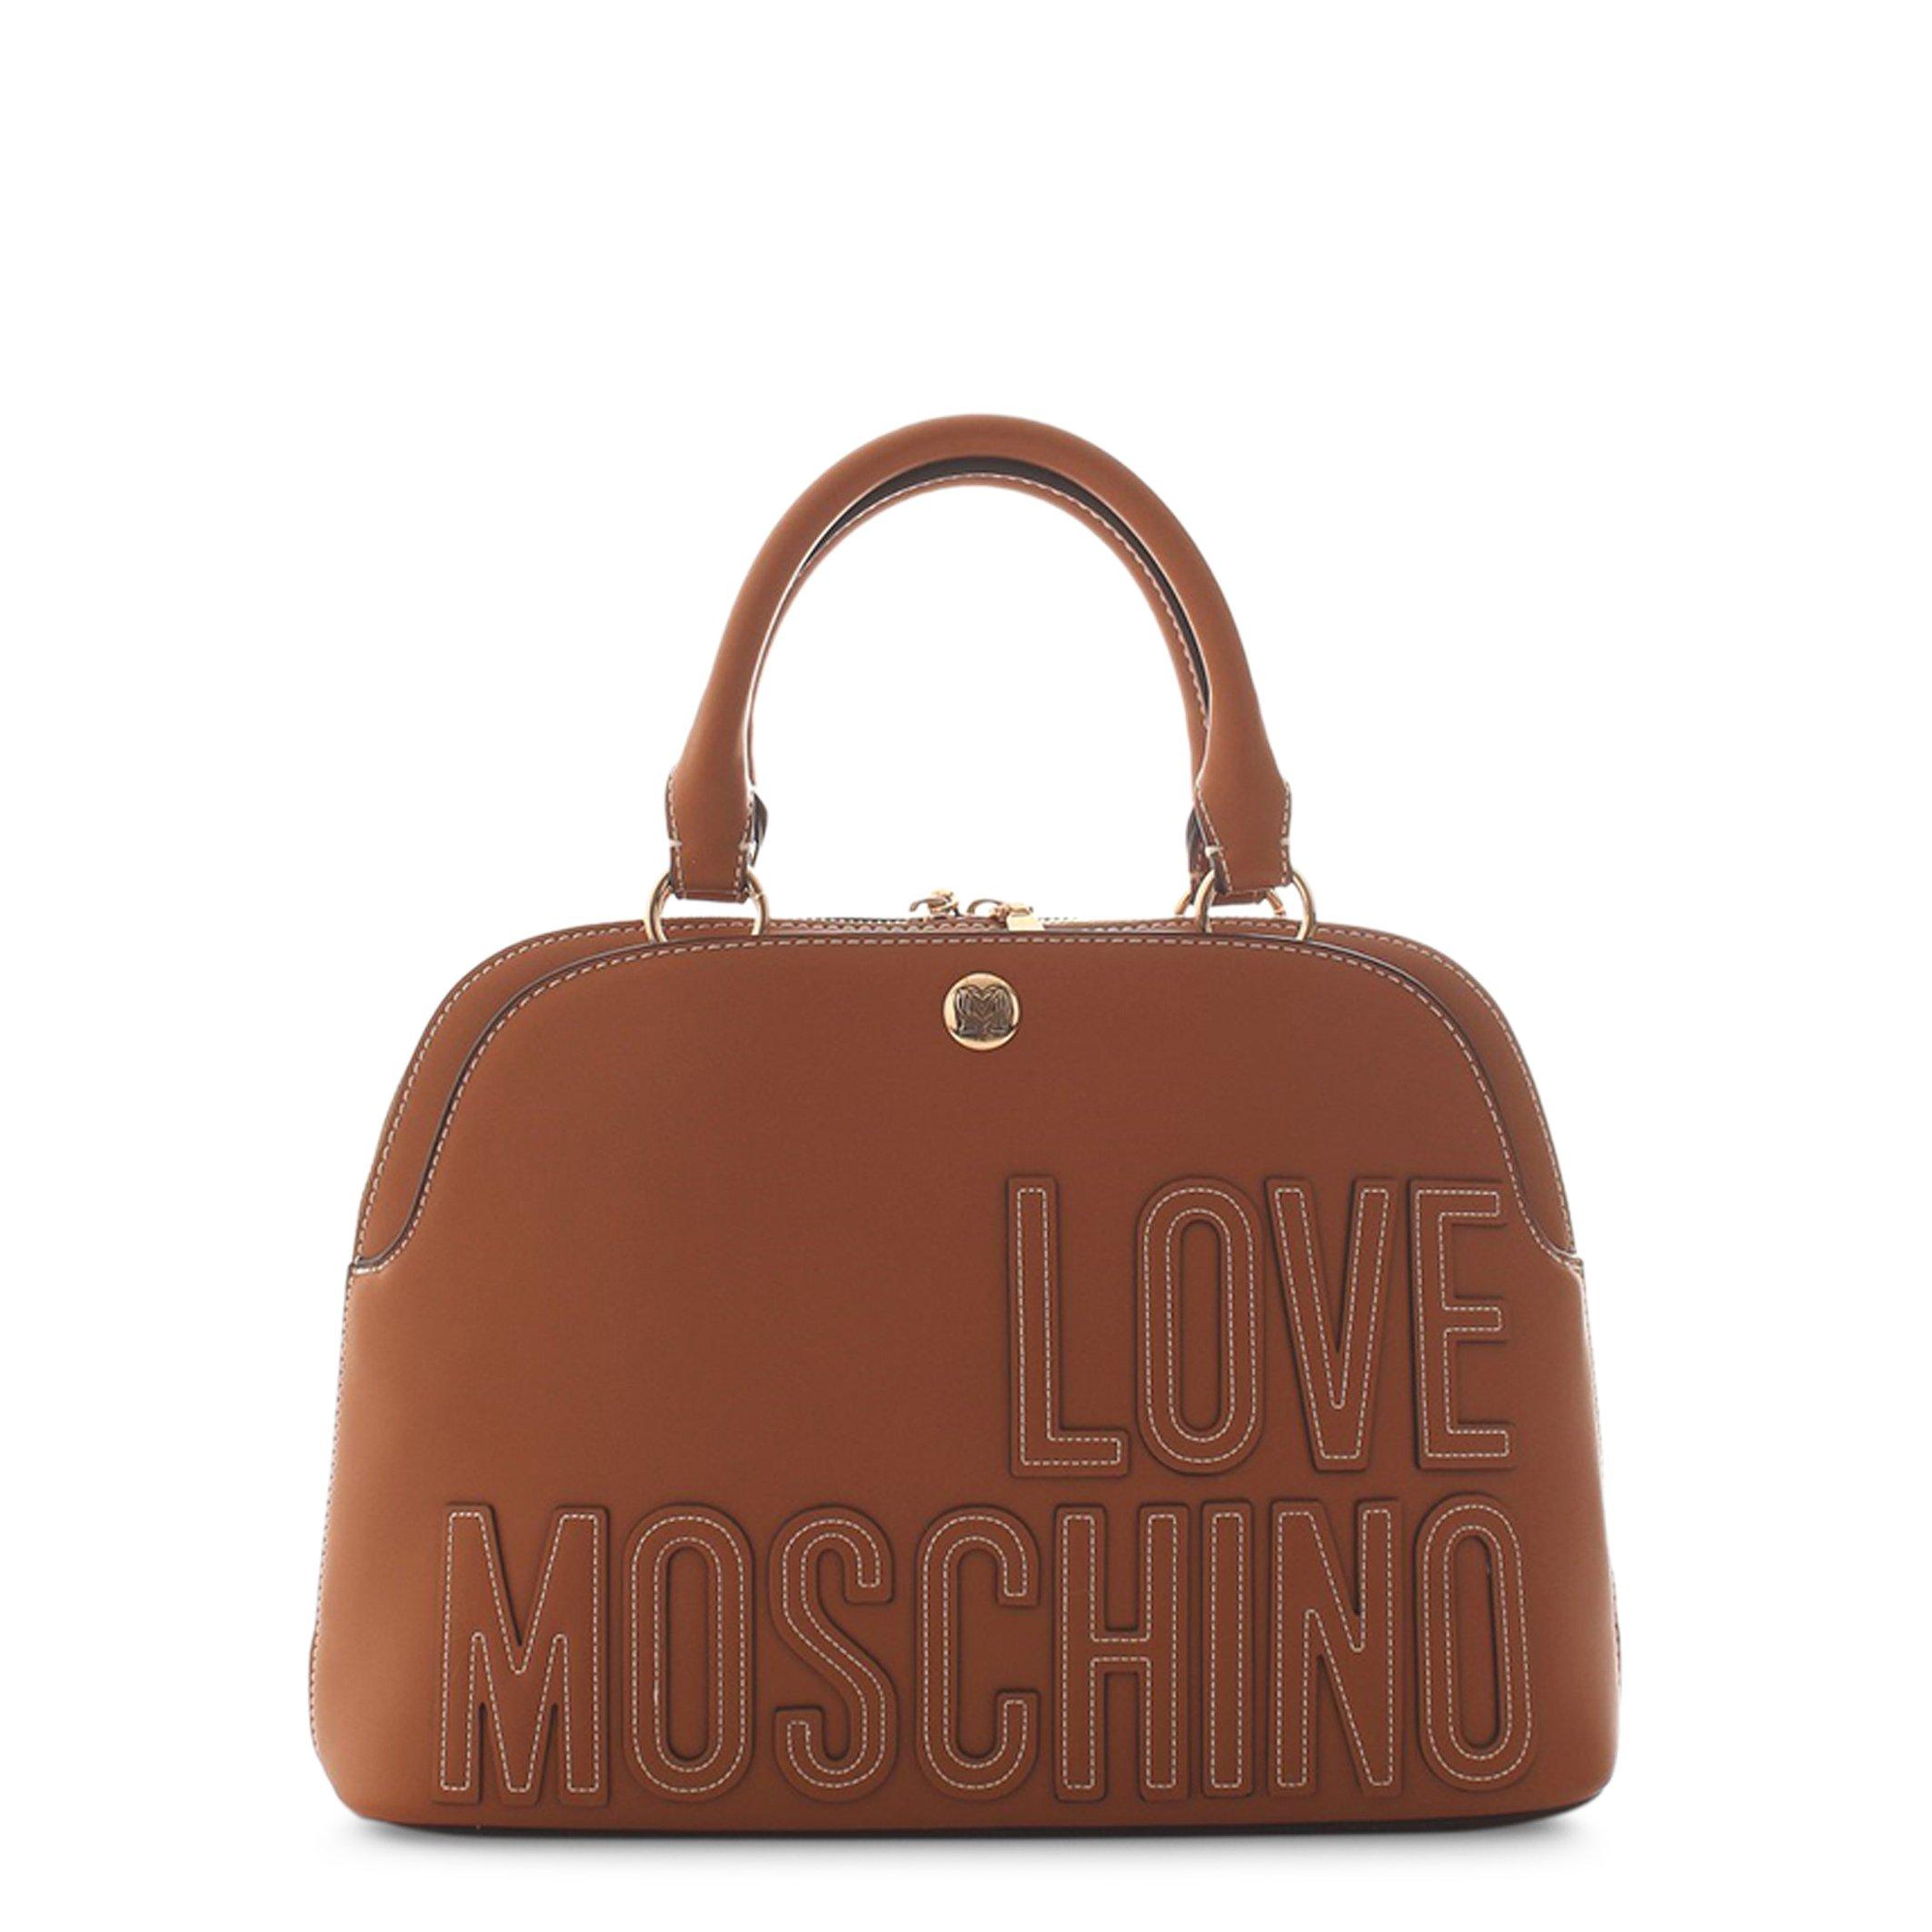 Love Moschino Women's Handbag Various Colours JC4176PP1DLH0 - brown NOSIZE